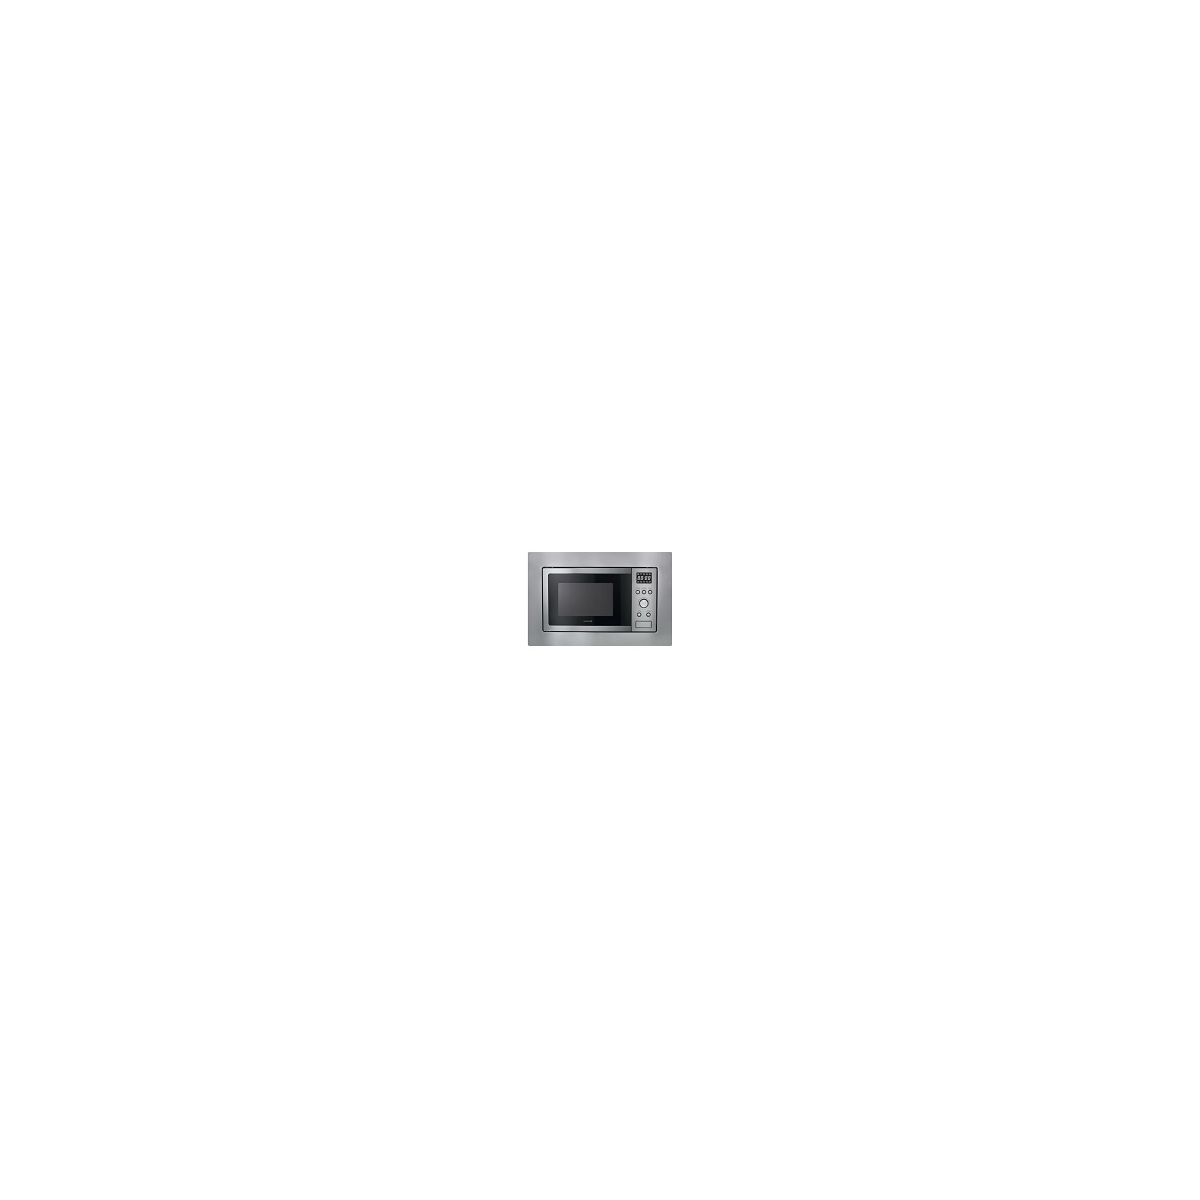 Micro ondes encastrable ESSENTIELB EMEG 201i